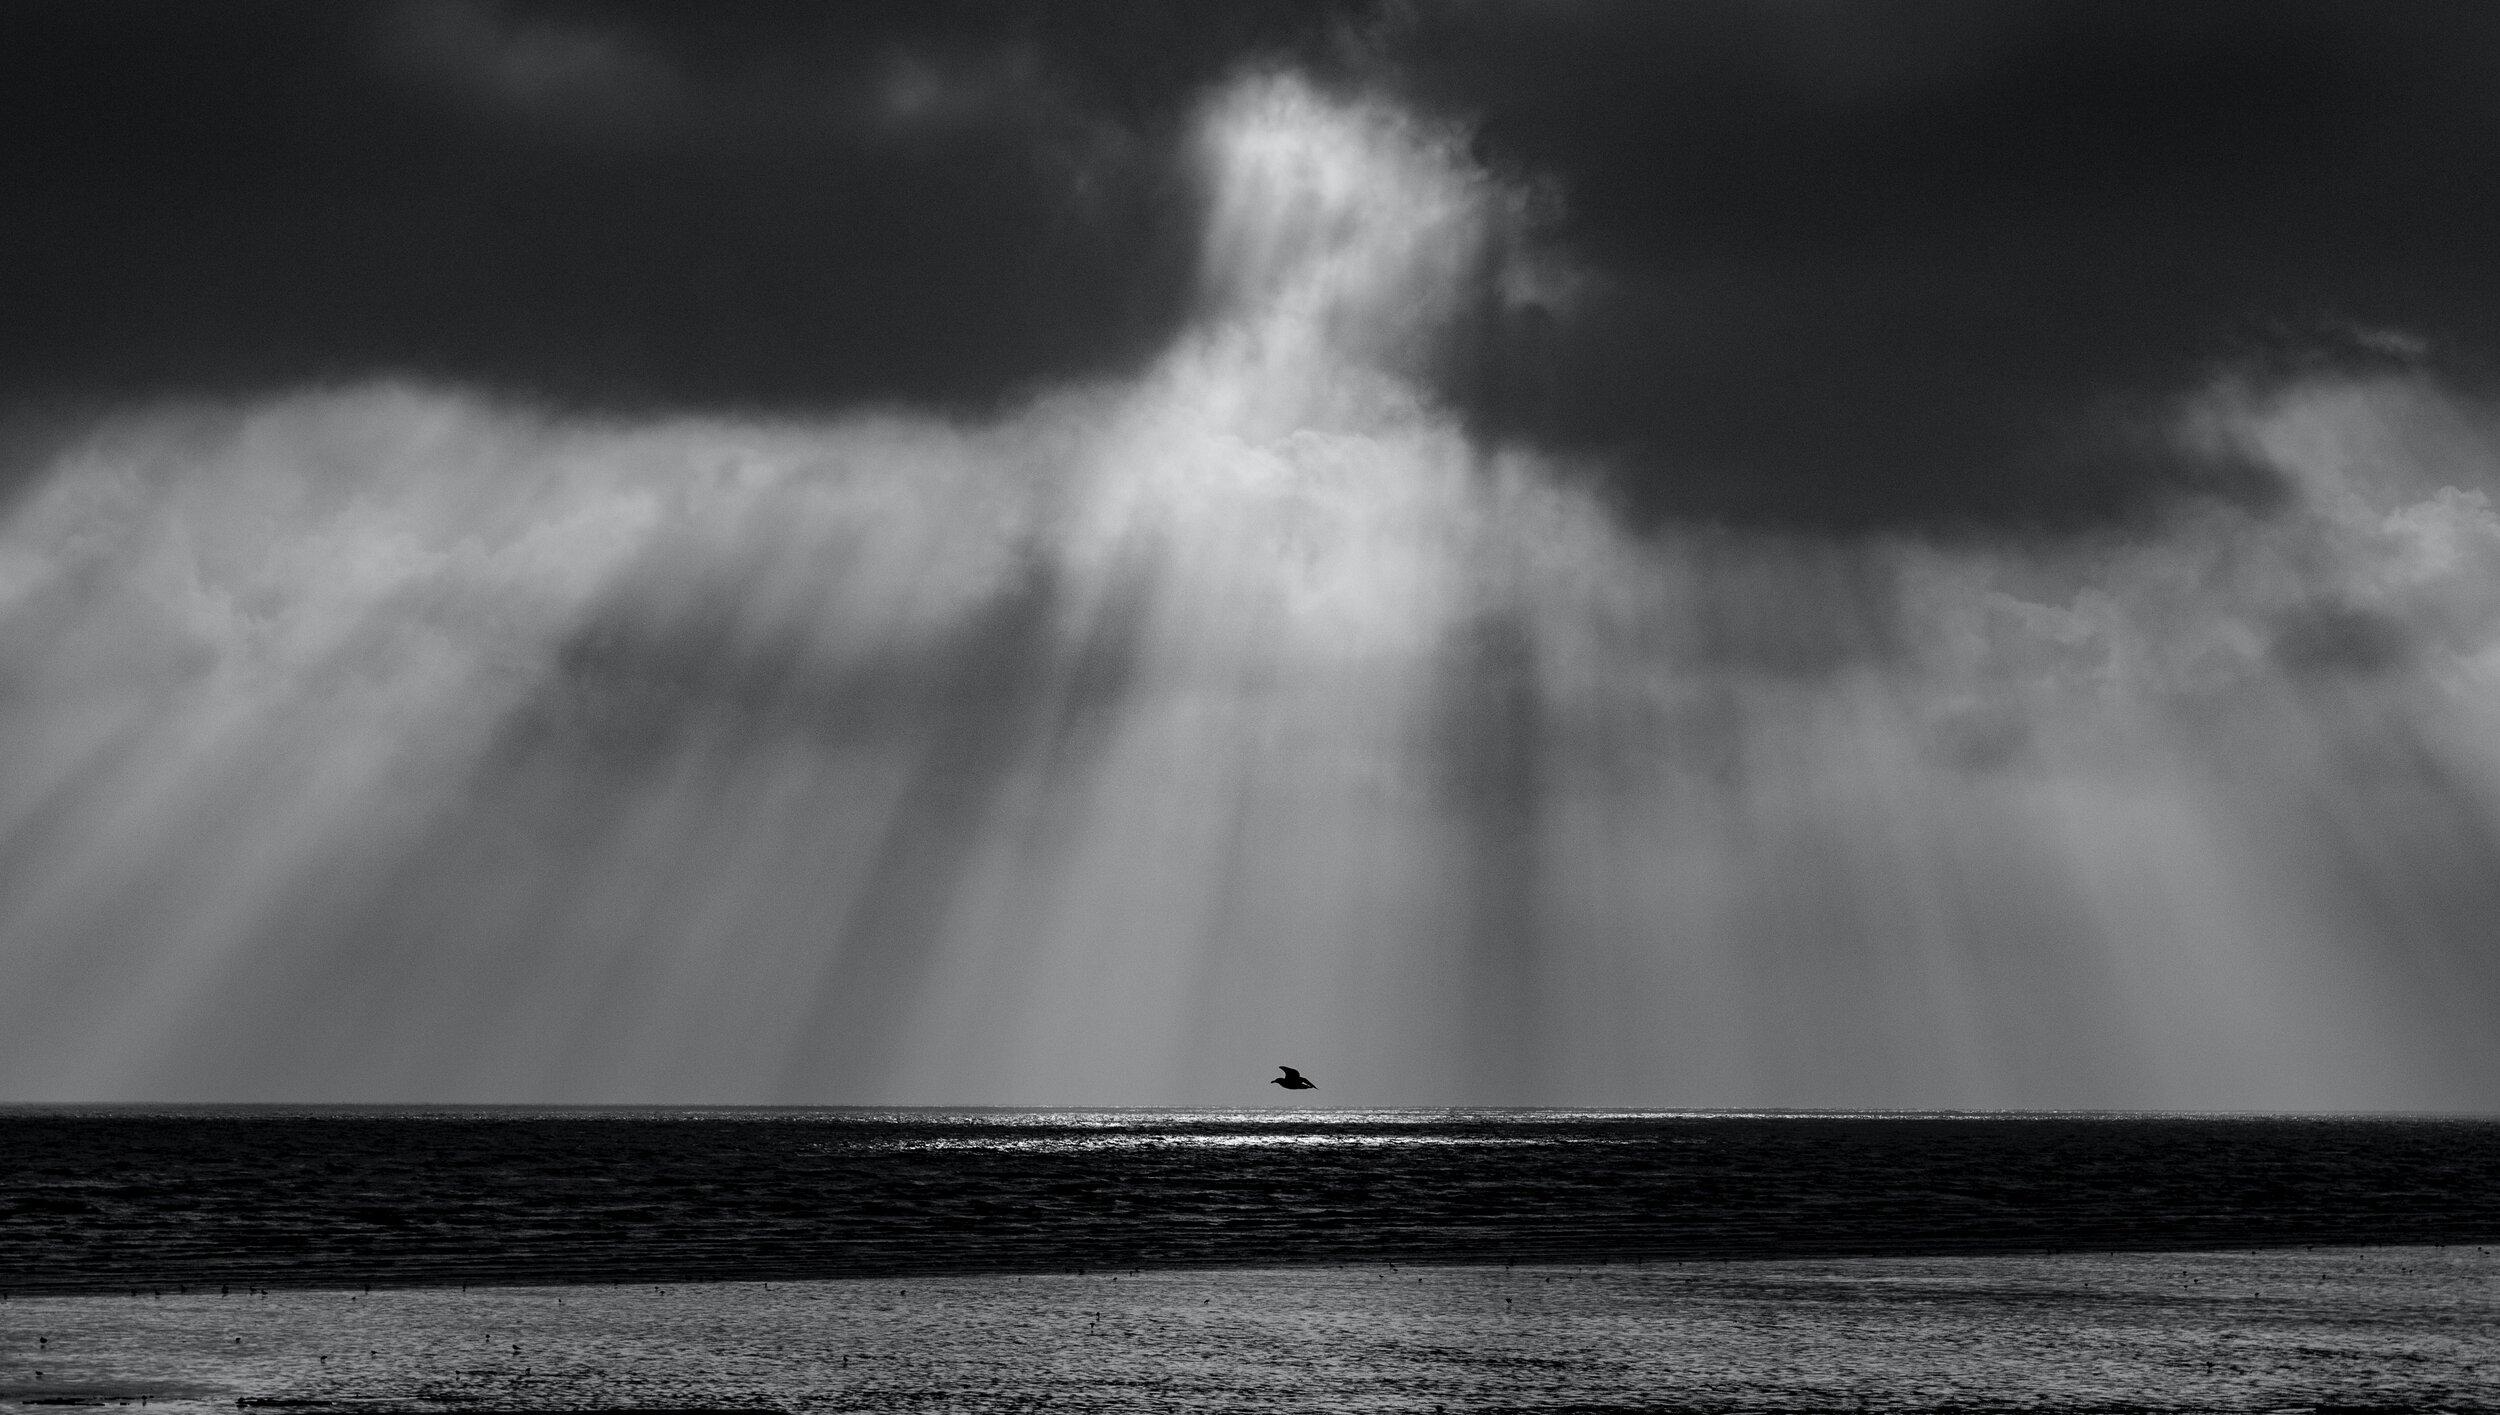 Photo by  Zoltan Tasi  on  Unsplash